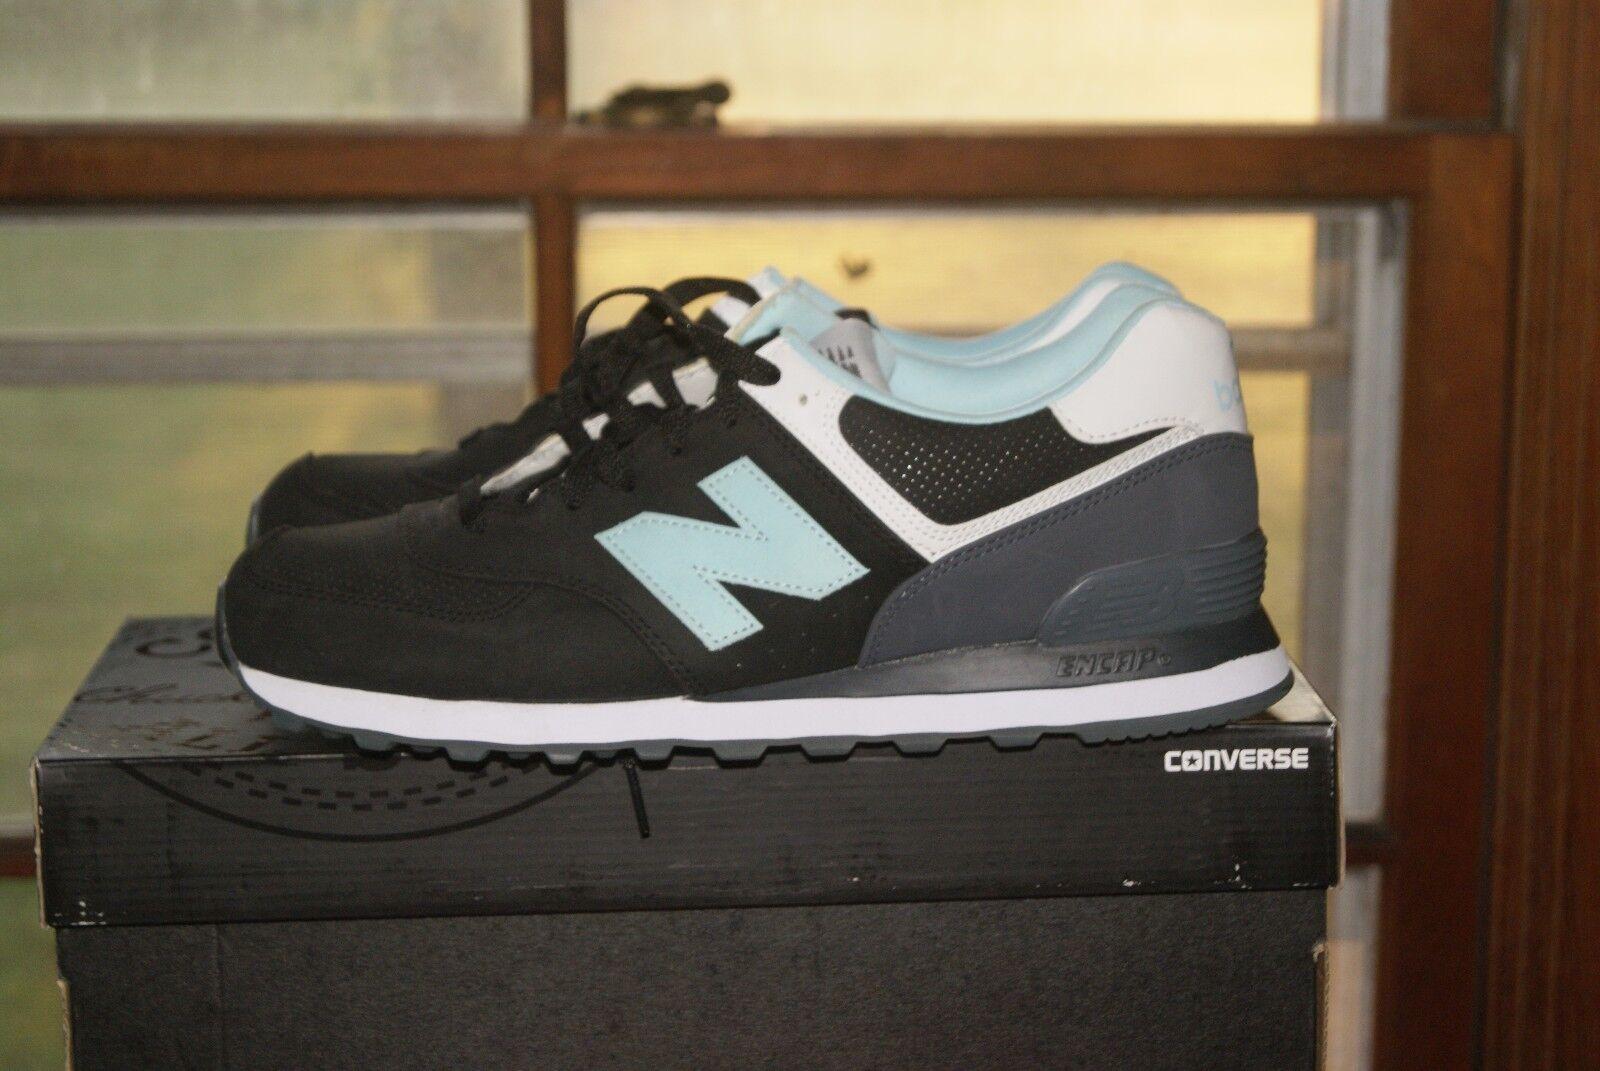 Uomo new balance ml sbw 574 sbw ml nero gray blue 12 shoes run walk f346f0